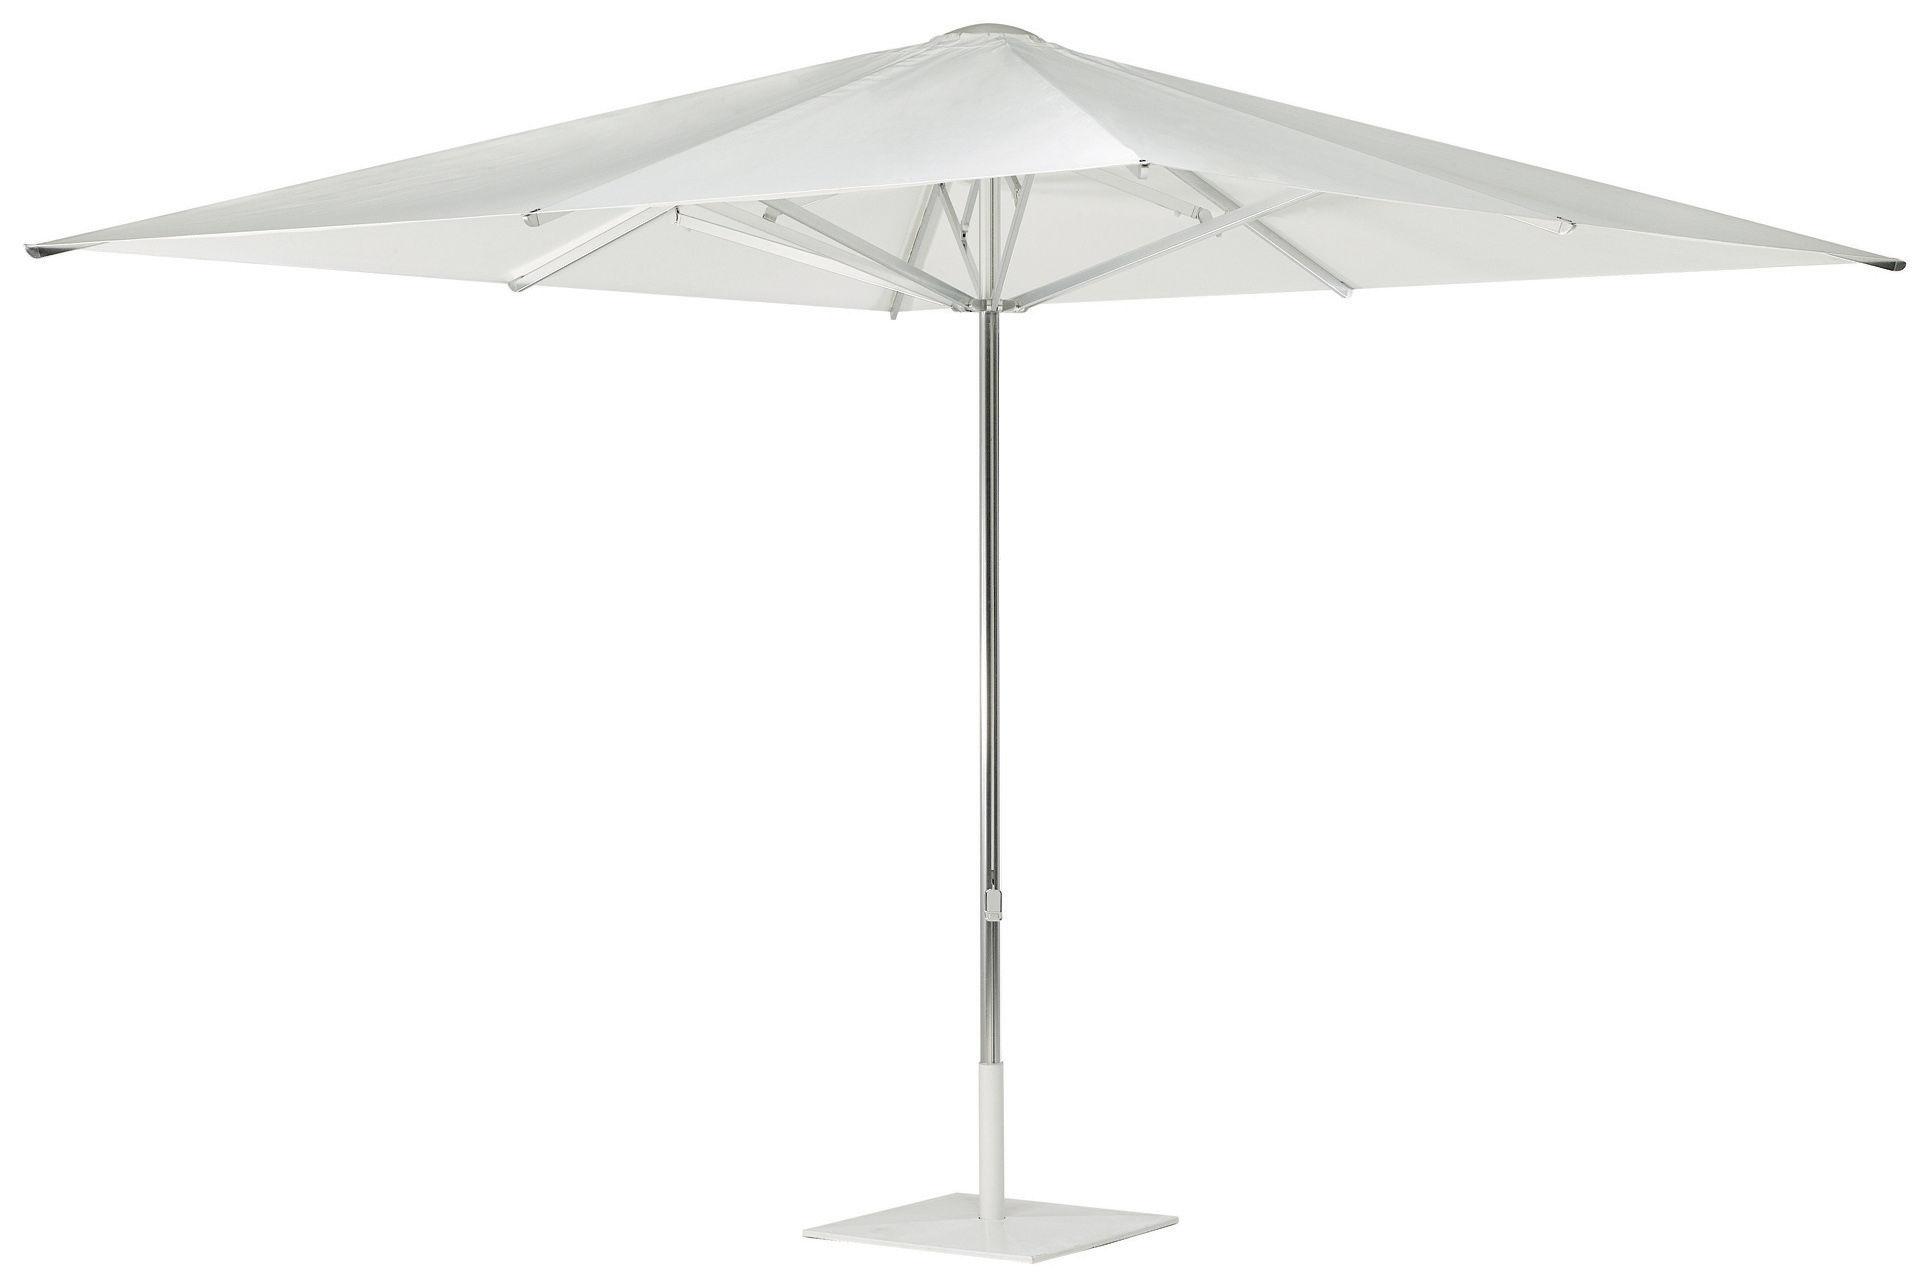 parasol shade pied central 300 x 300 cm toile blanche pied alu base blanche emu. Black Bedroom Furniture Sets. Home Design Ideas